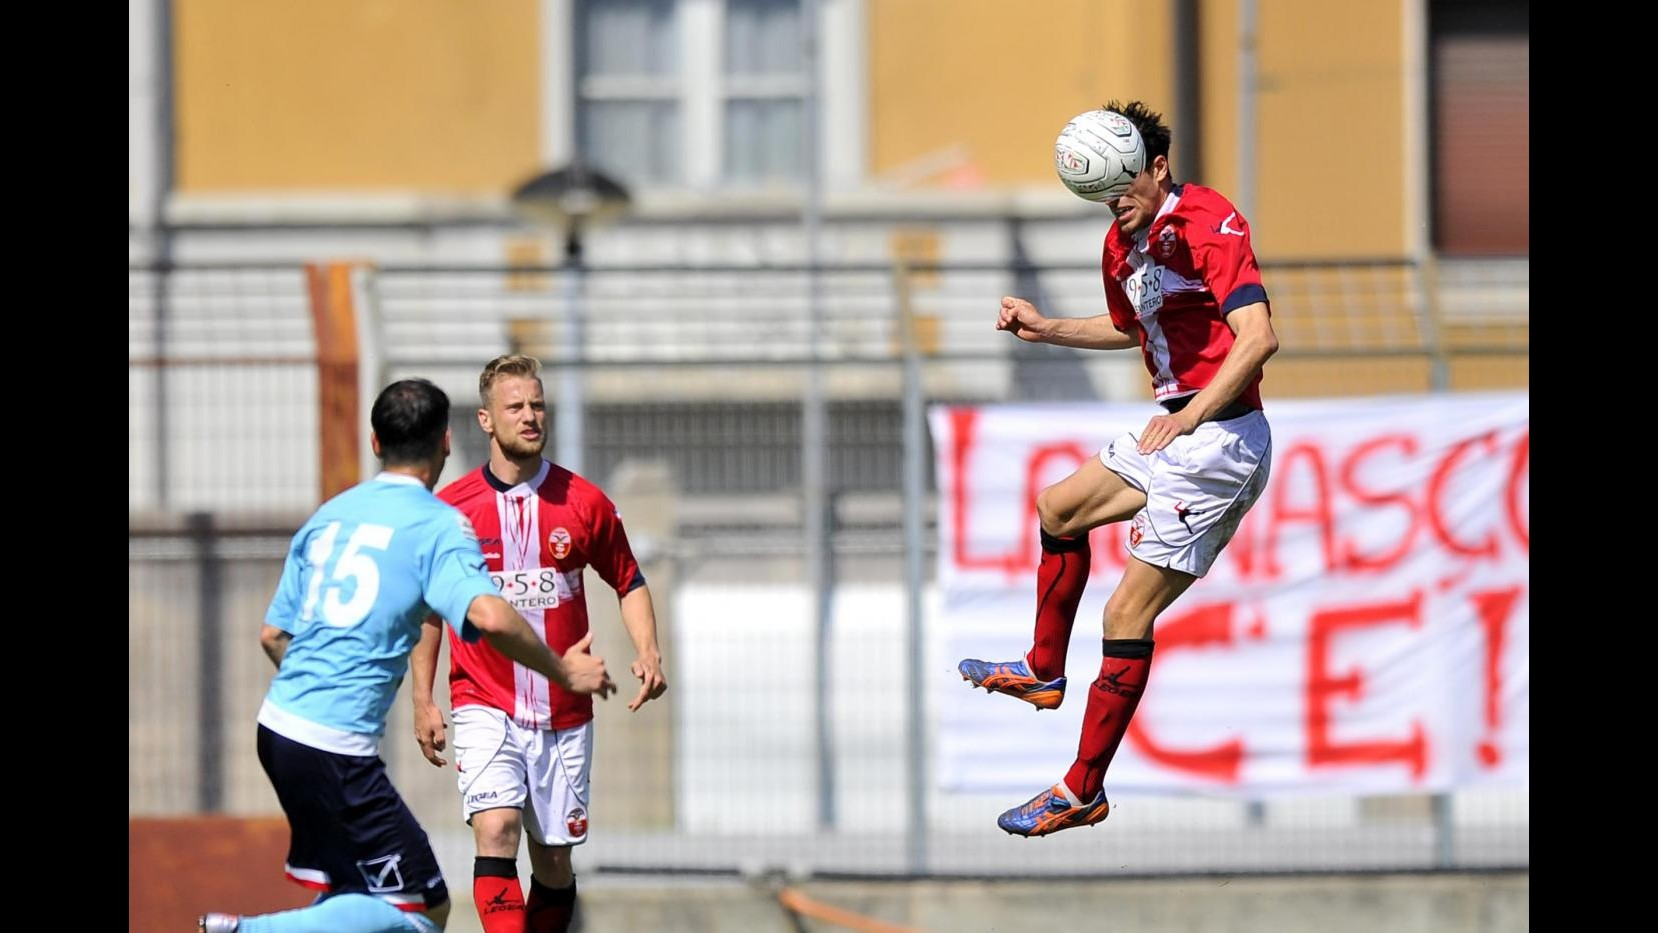 Lega Pro playout, Cuneo pareggia 0-0 col Mantova